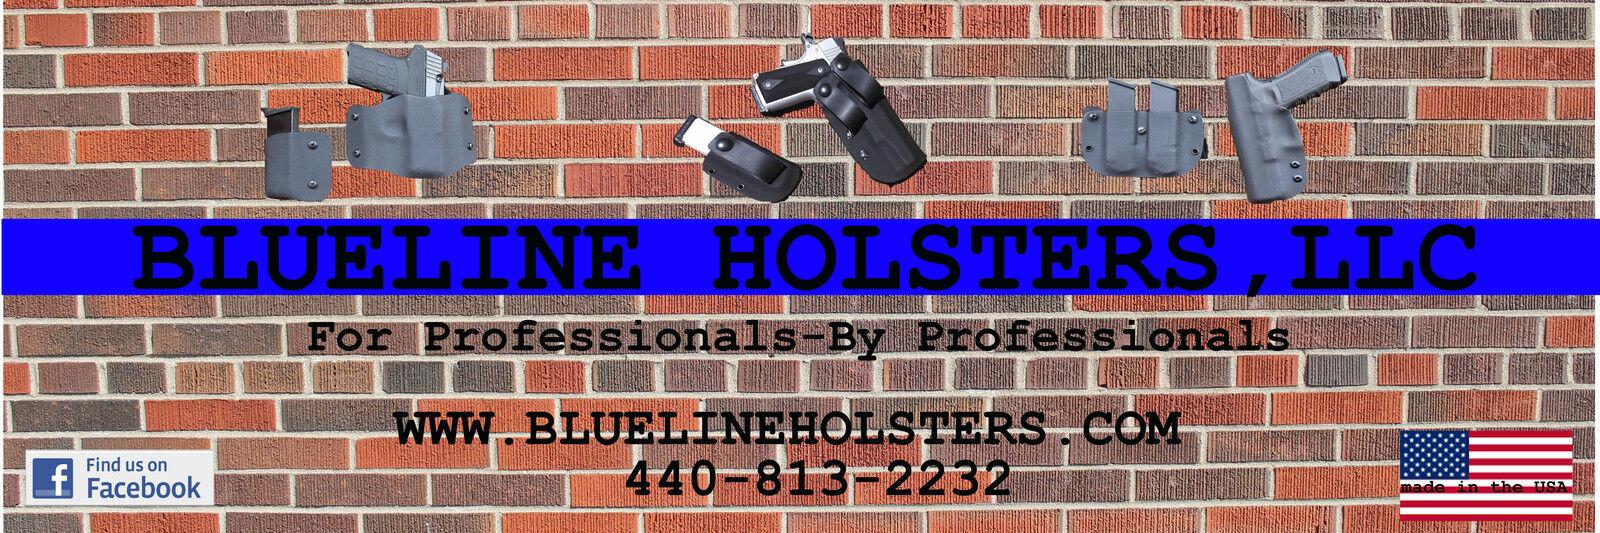 Blue Line Holsters,LLc